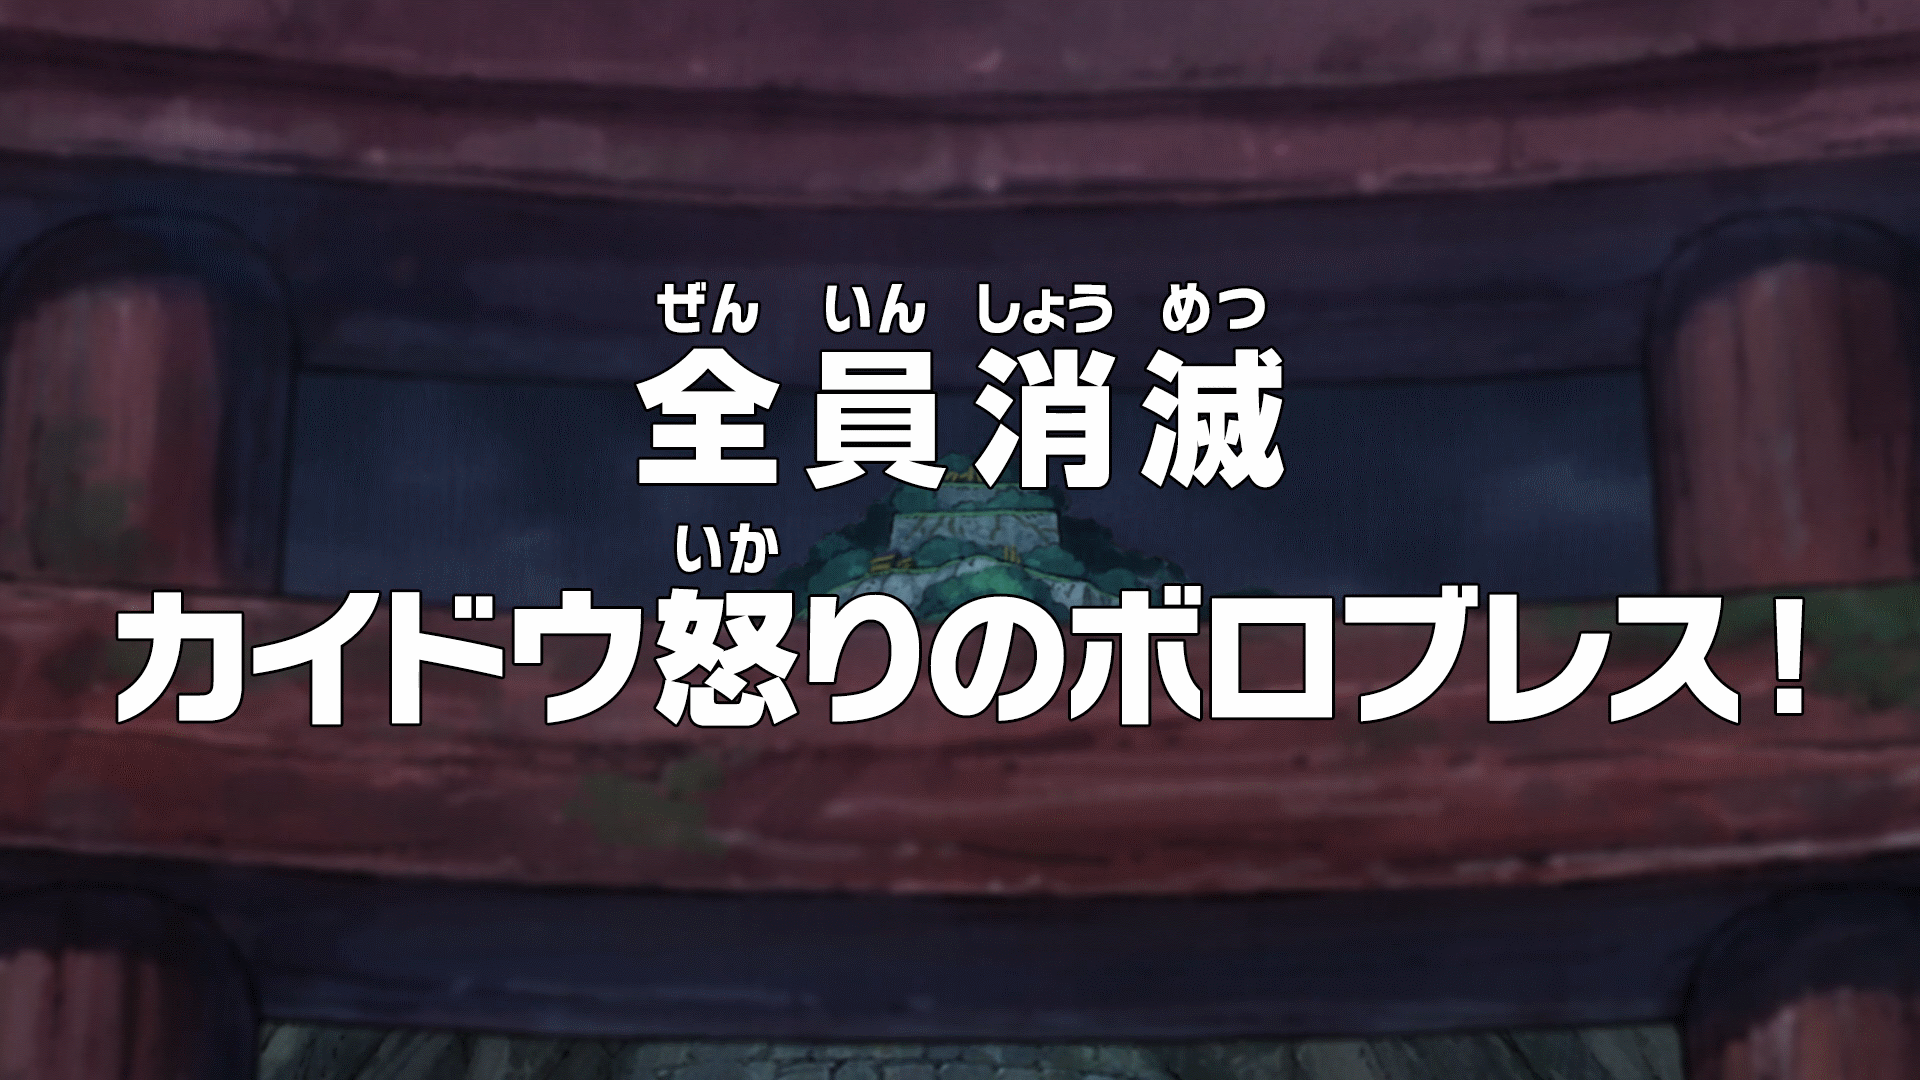 Episode 913